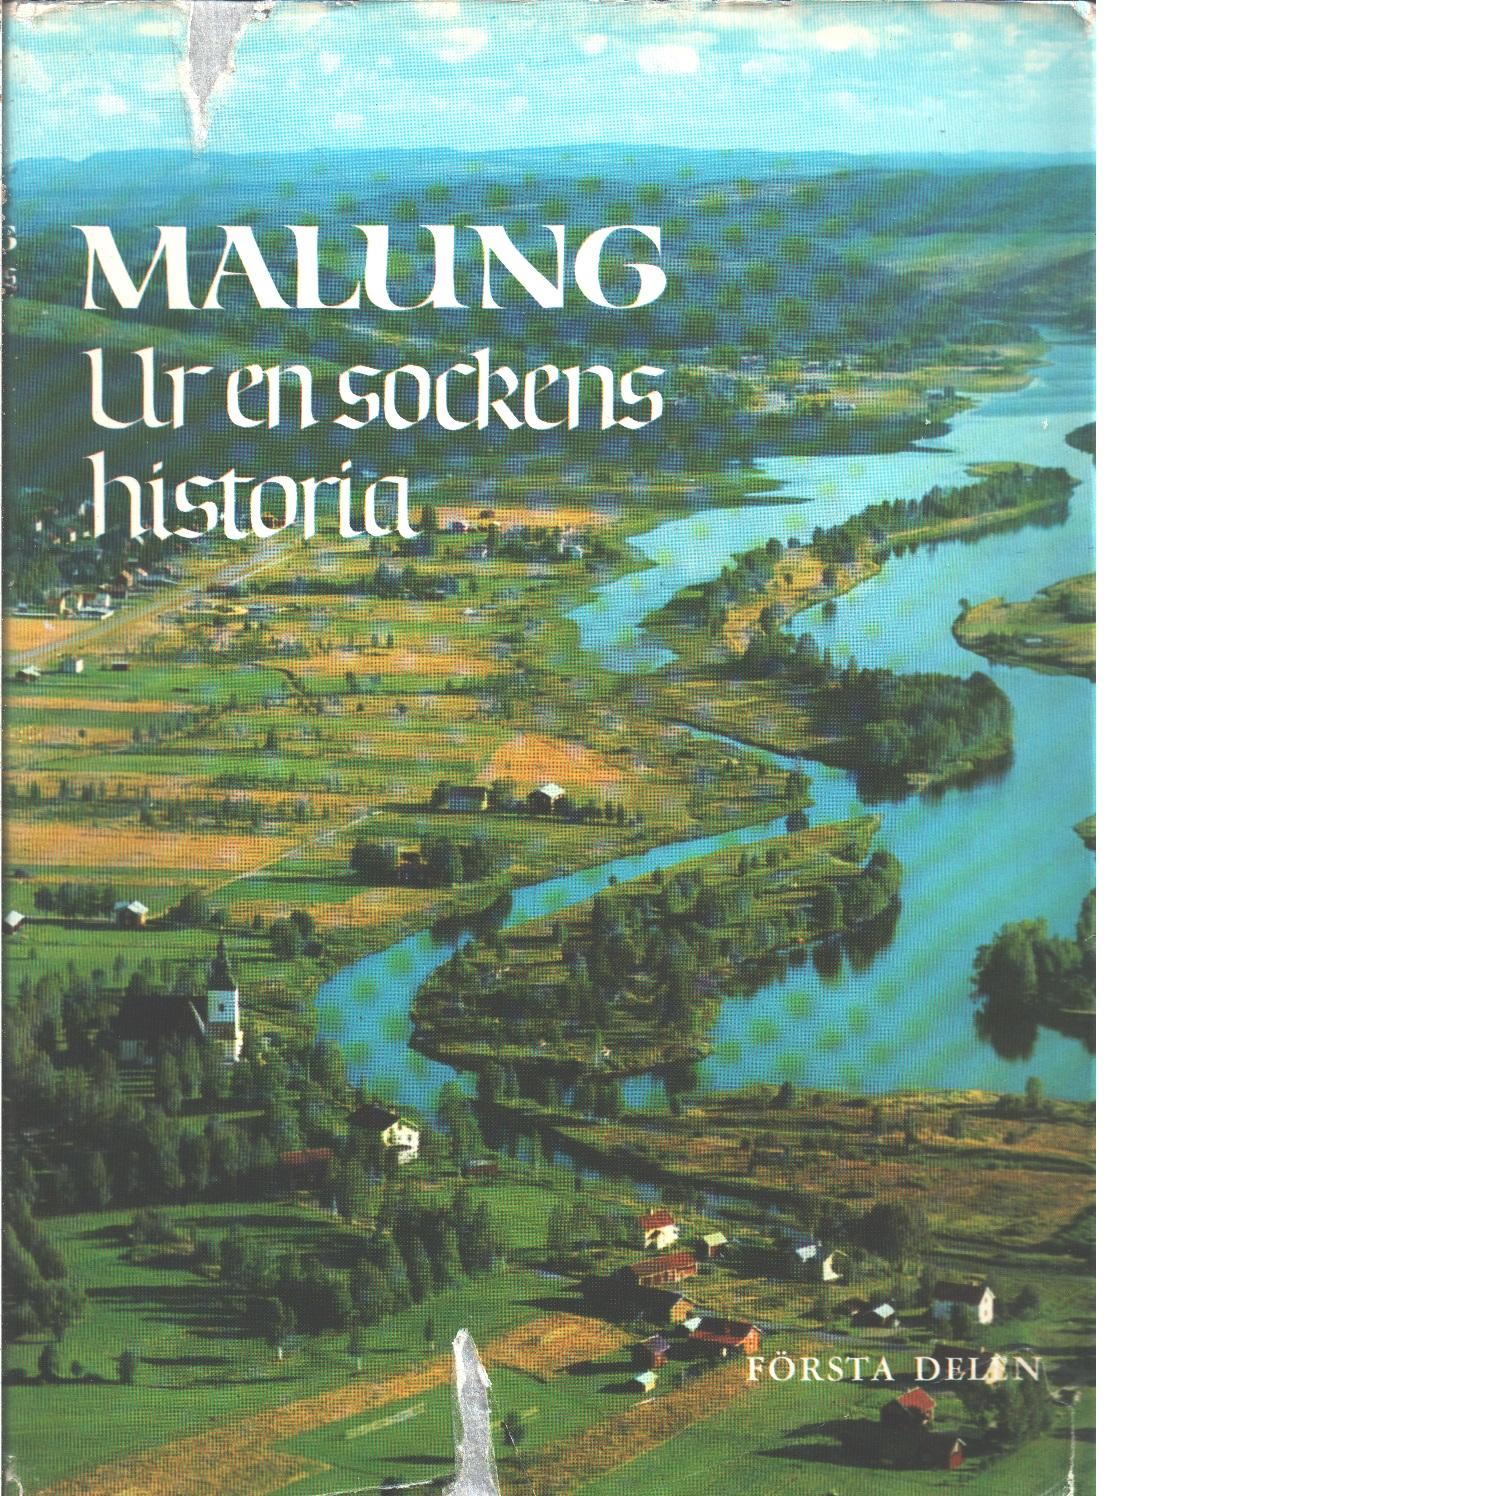 Malung : ur en sockens historia. D. 1 - Red. Veirulf, Olle